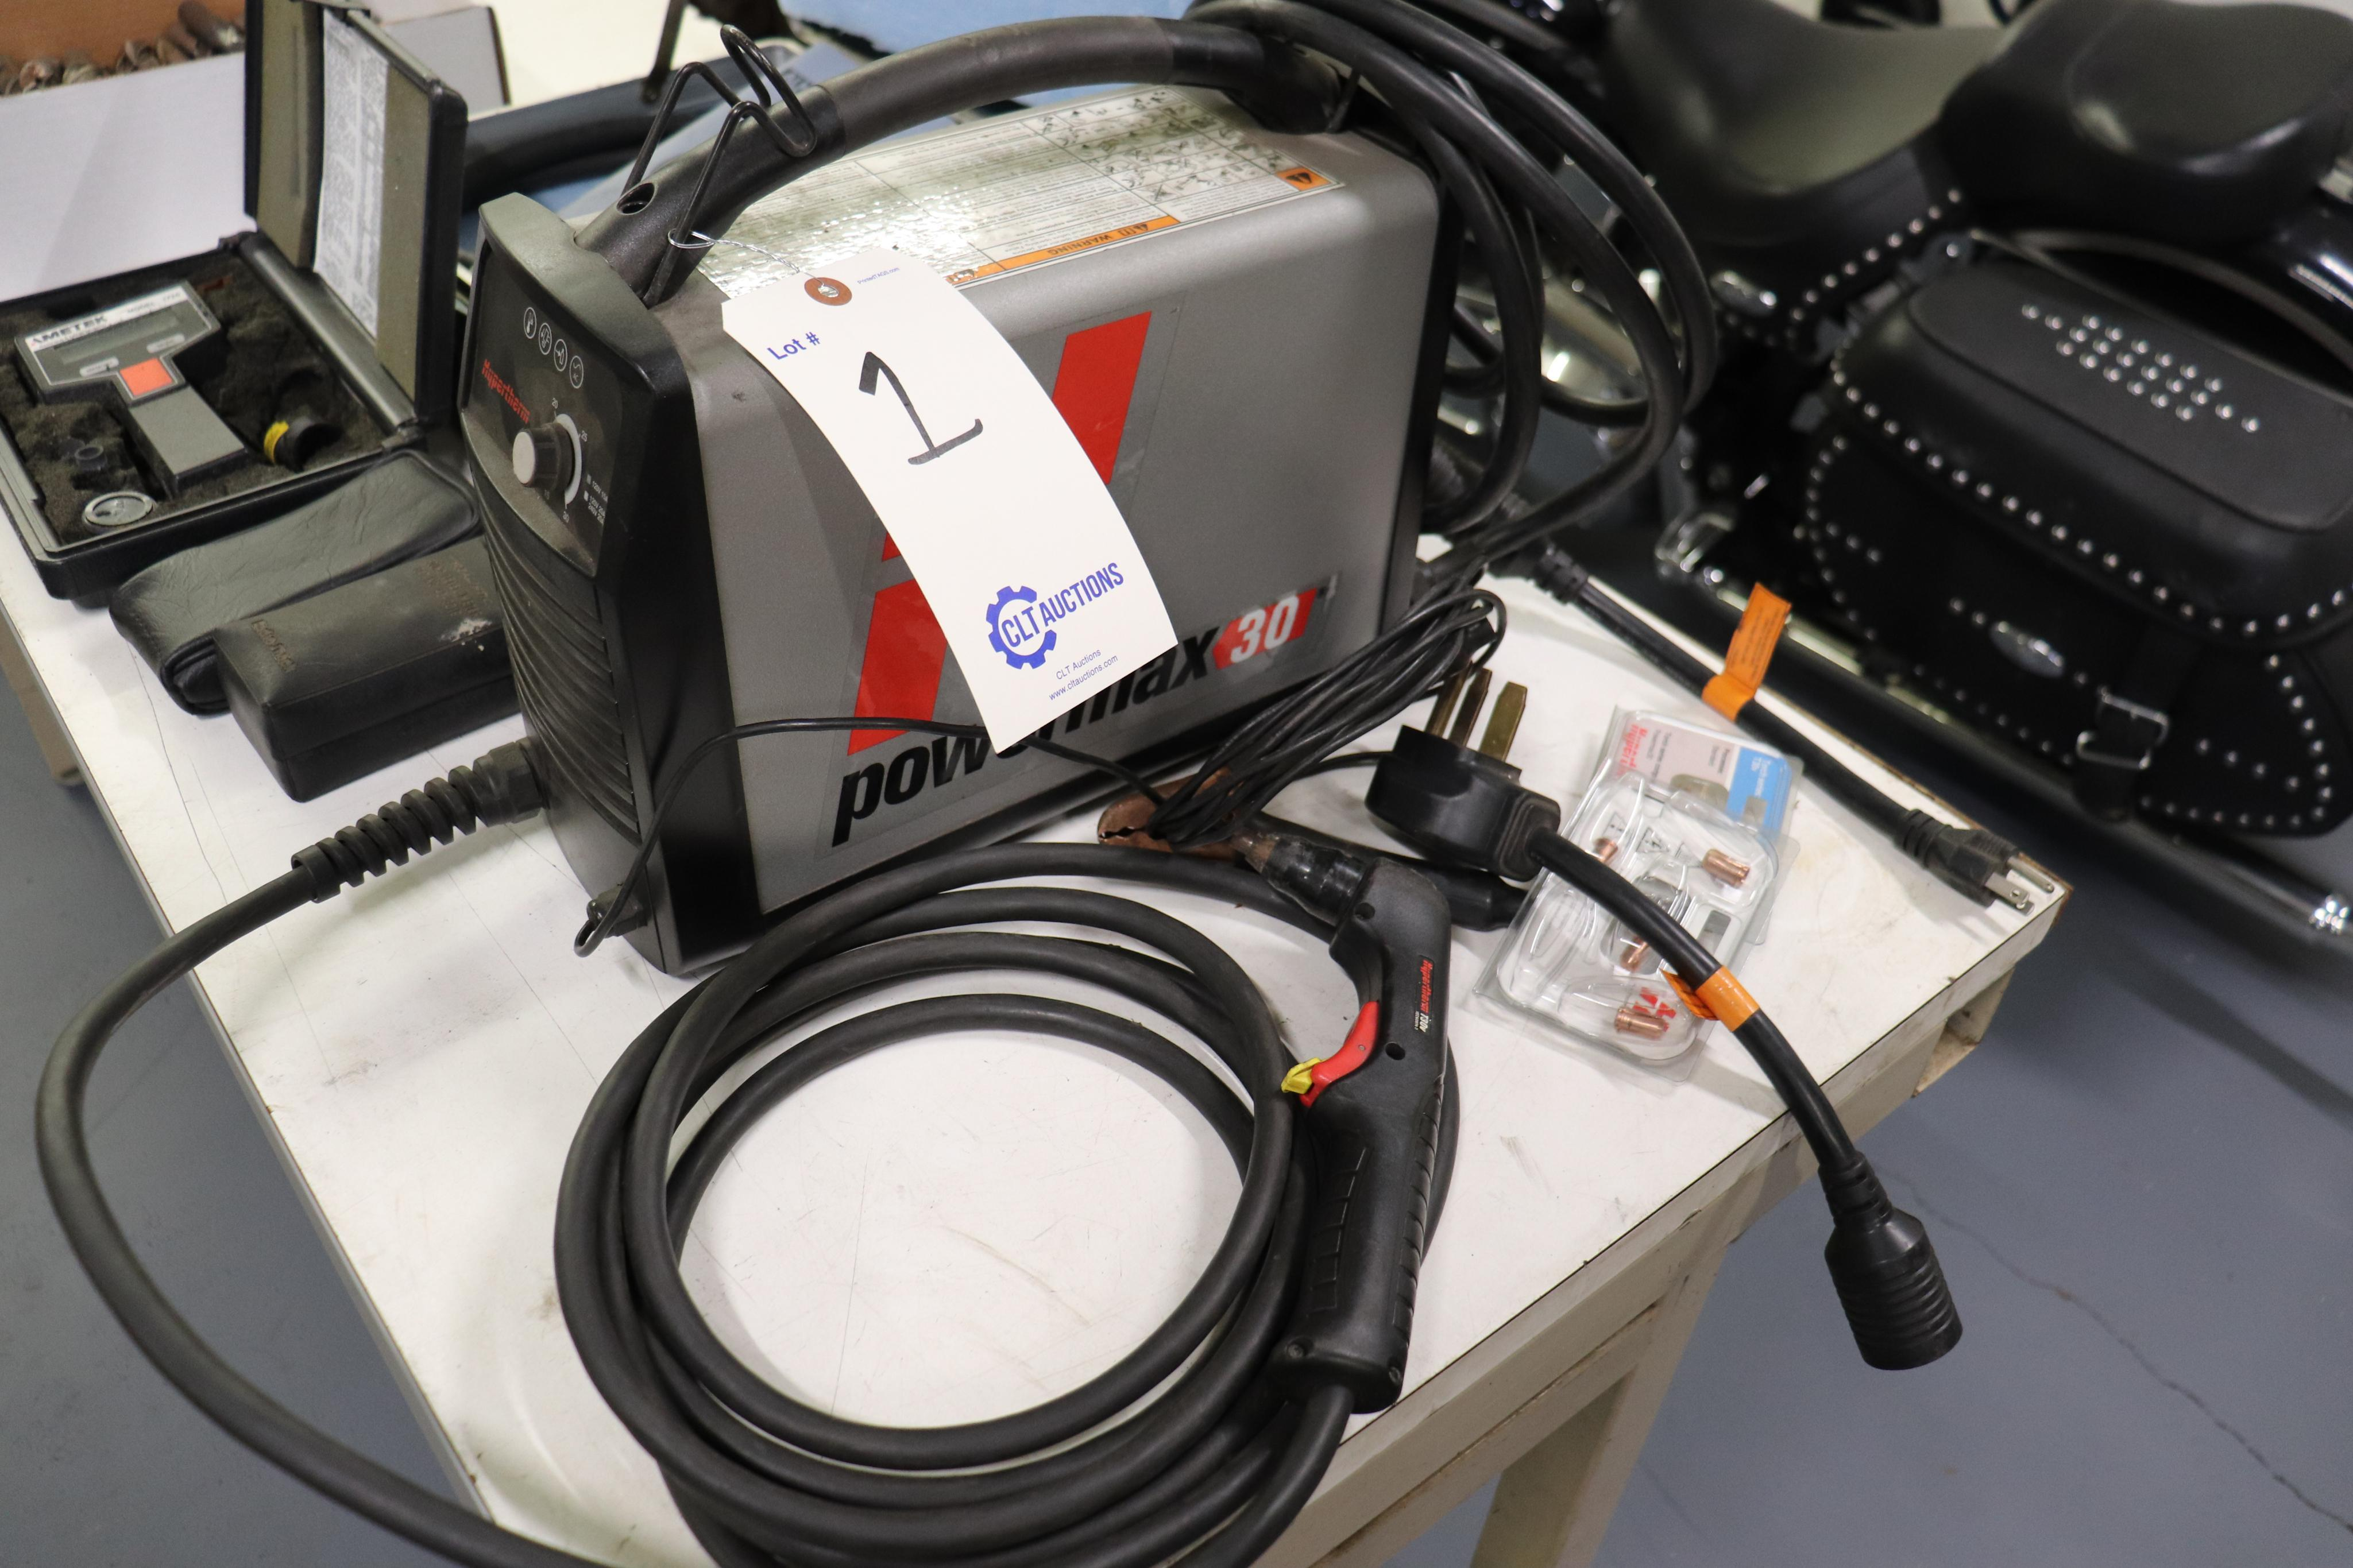 Hypertherm Powermax 30 plasma cutter